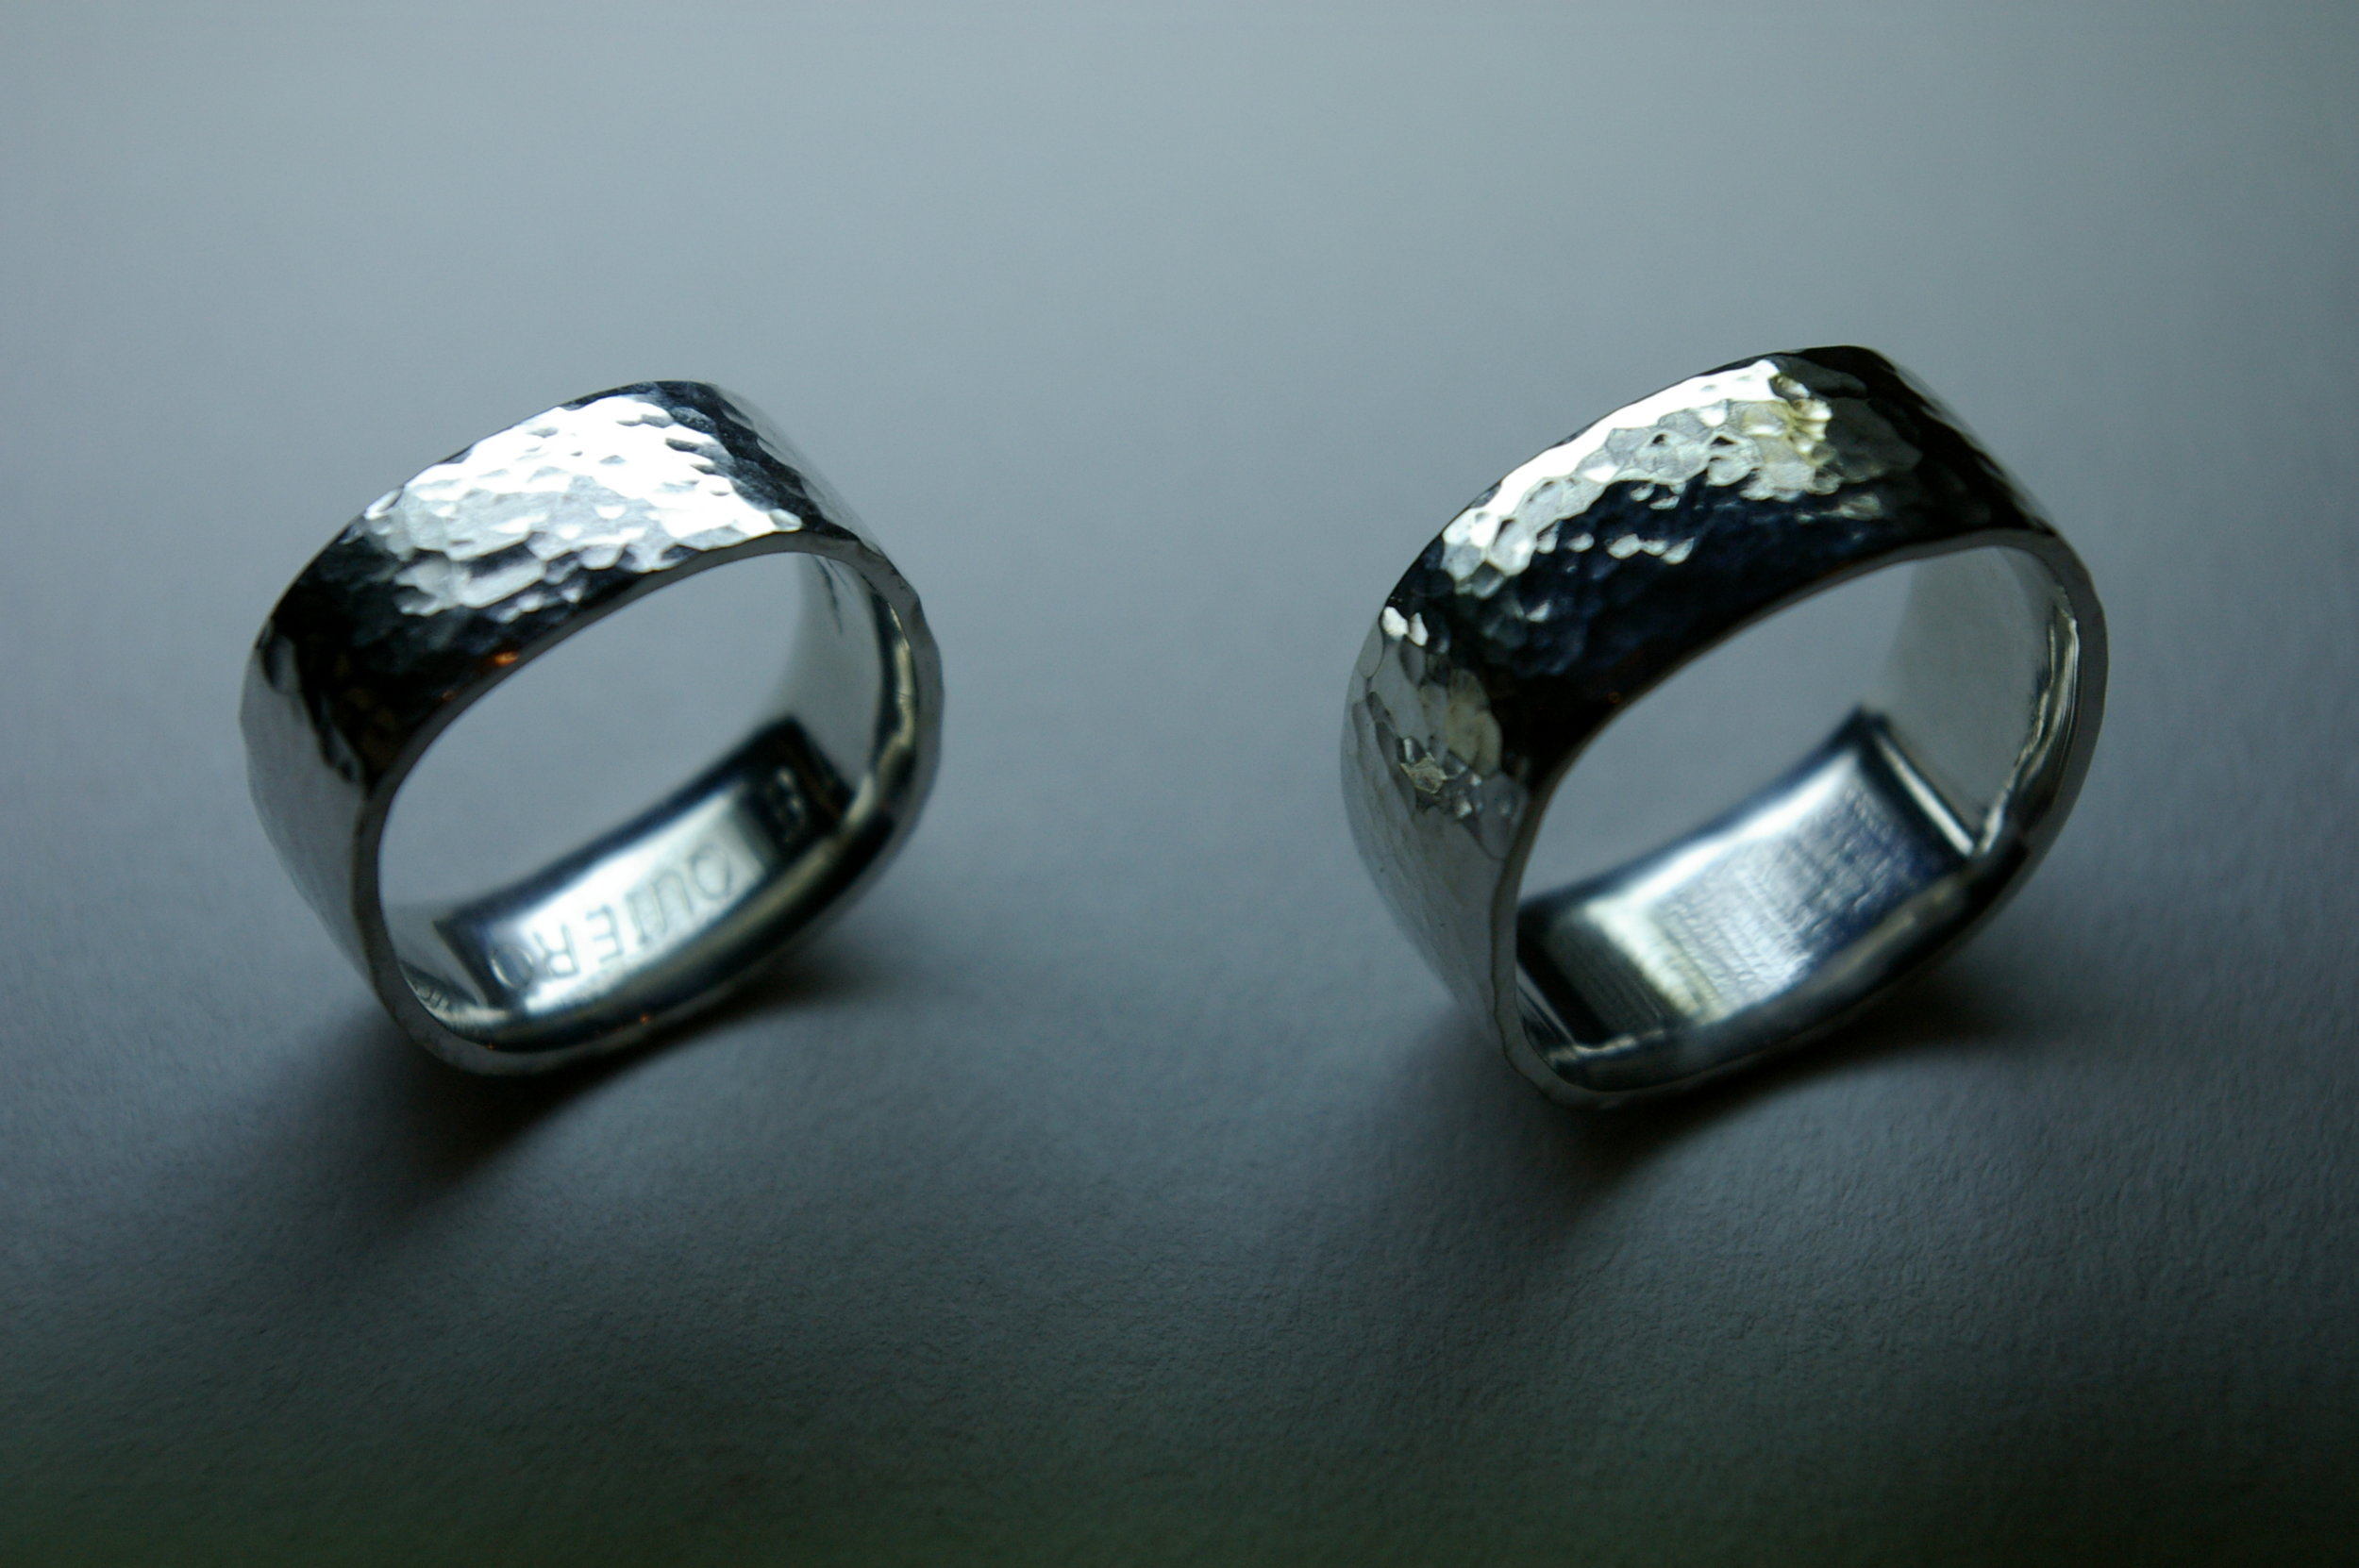 Handmade Platinum Ring Set, Hammered Finish